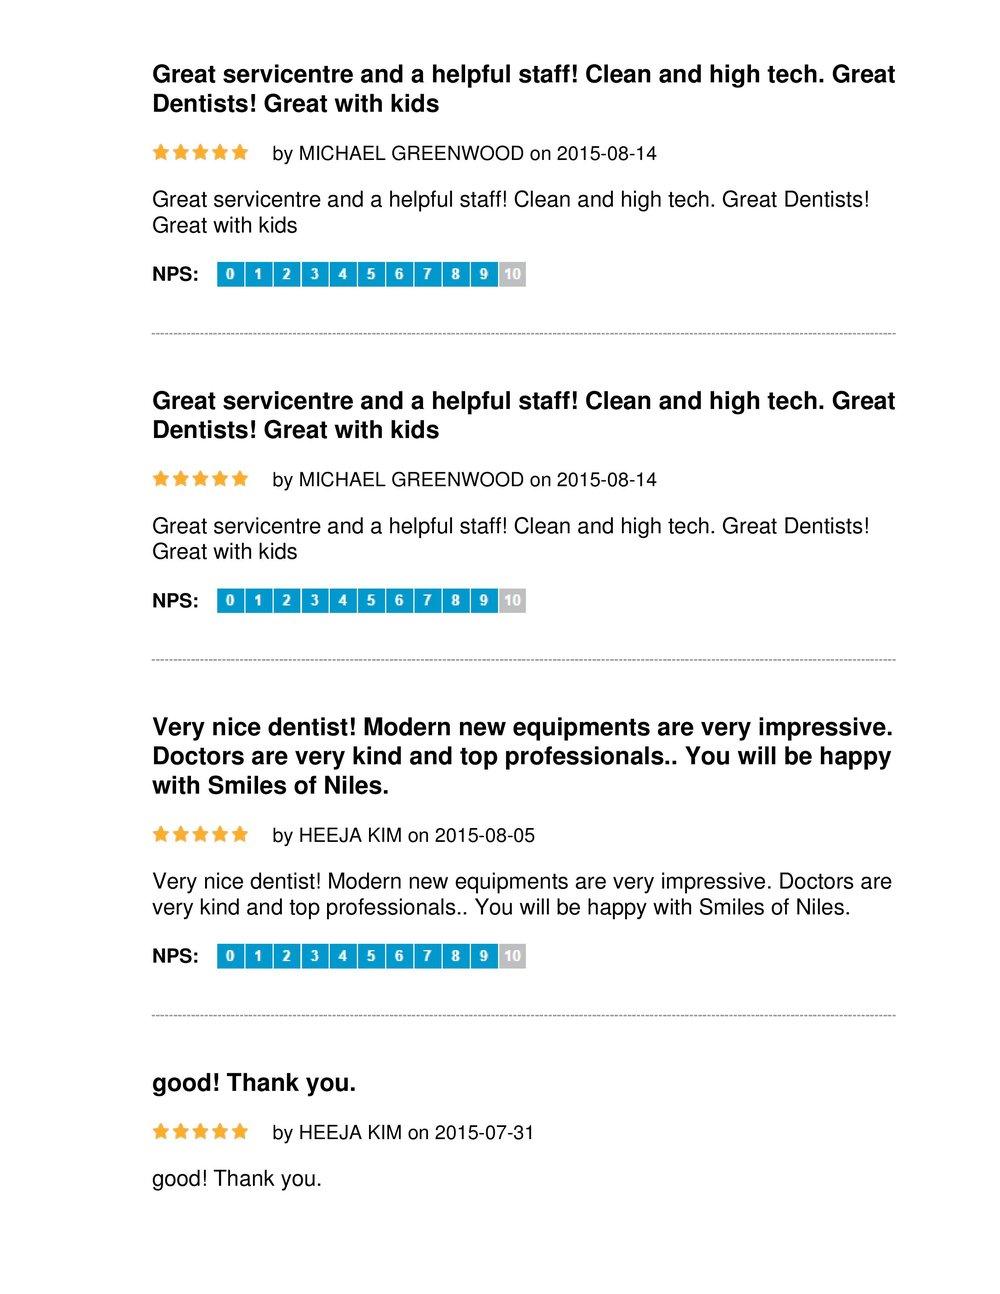 smiles of niles demandforce reviews-page-006.jpg